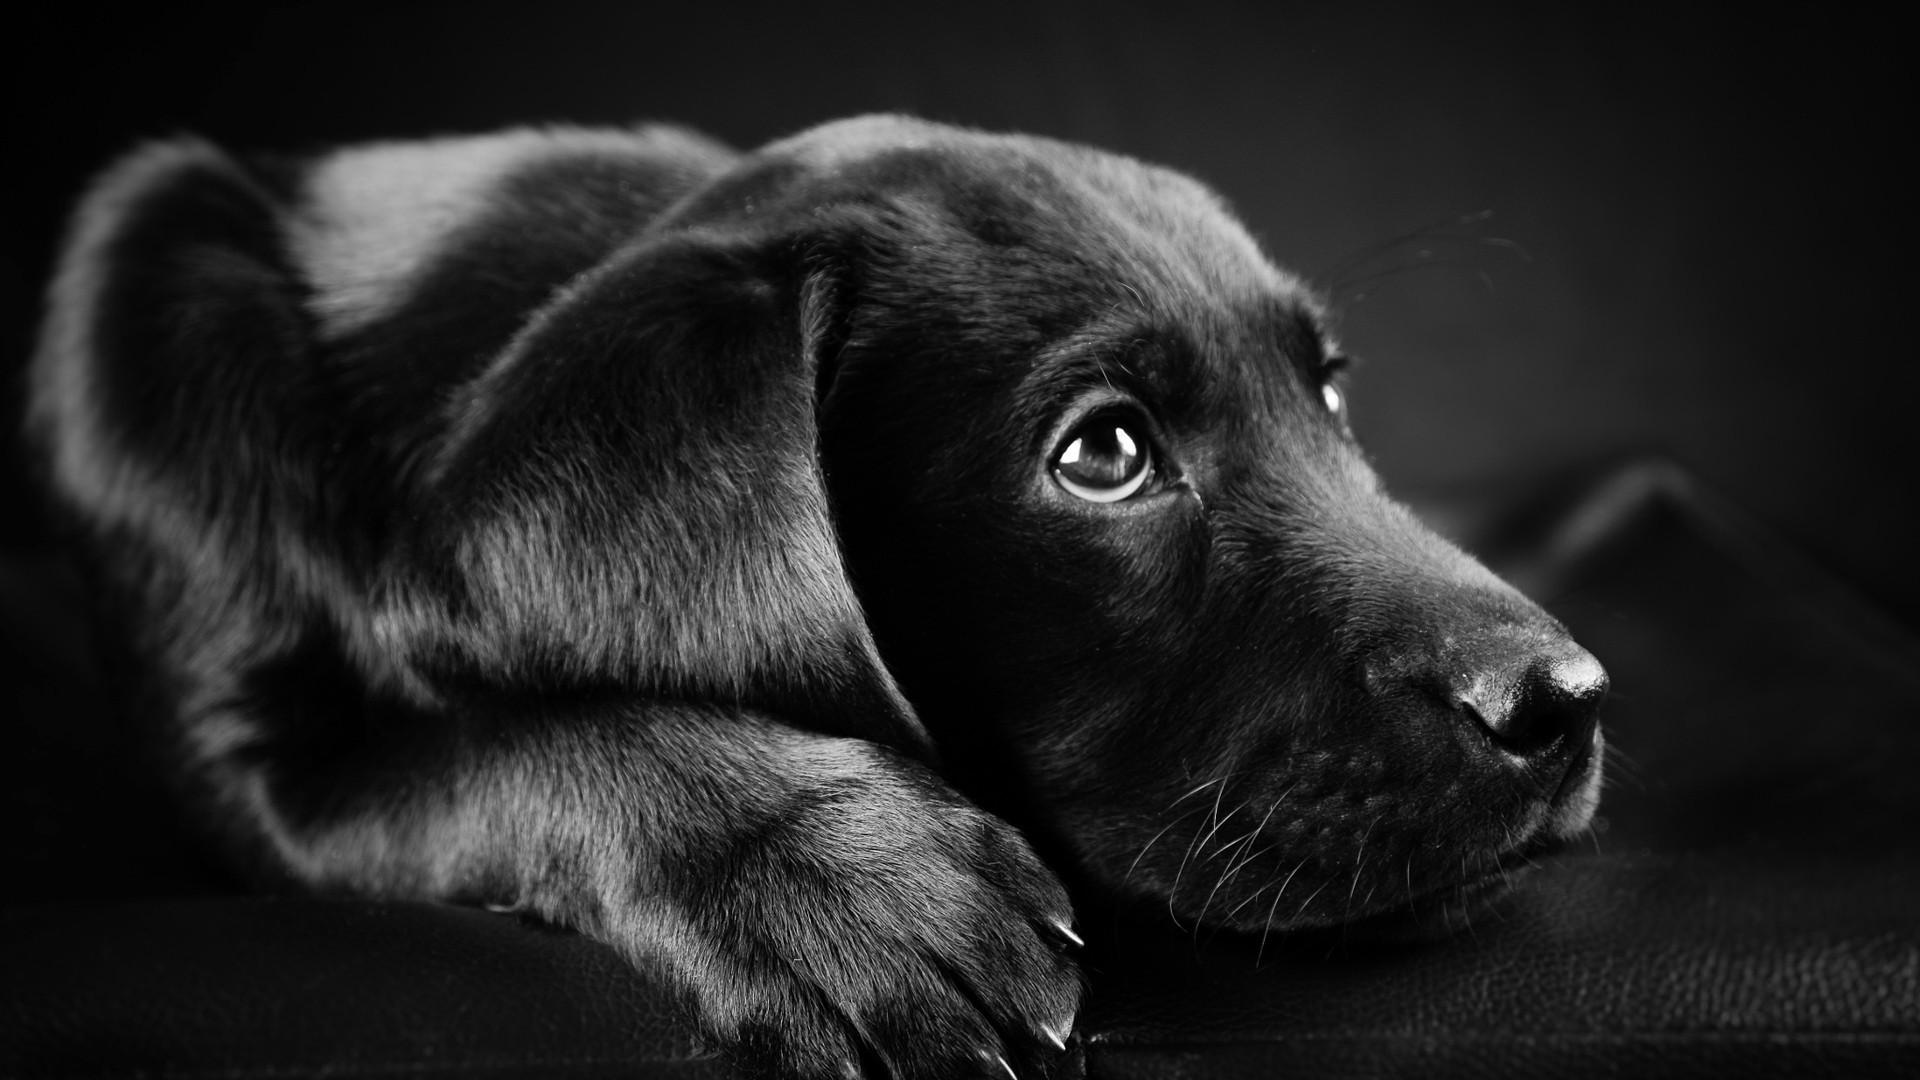 Animals Dog Filter Wallpapers Hd Desktop And Mobile: Labrador Retriever Wallpaper (71+ Images